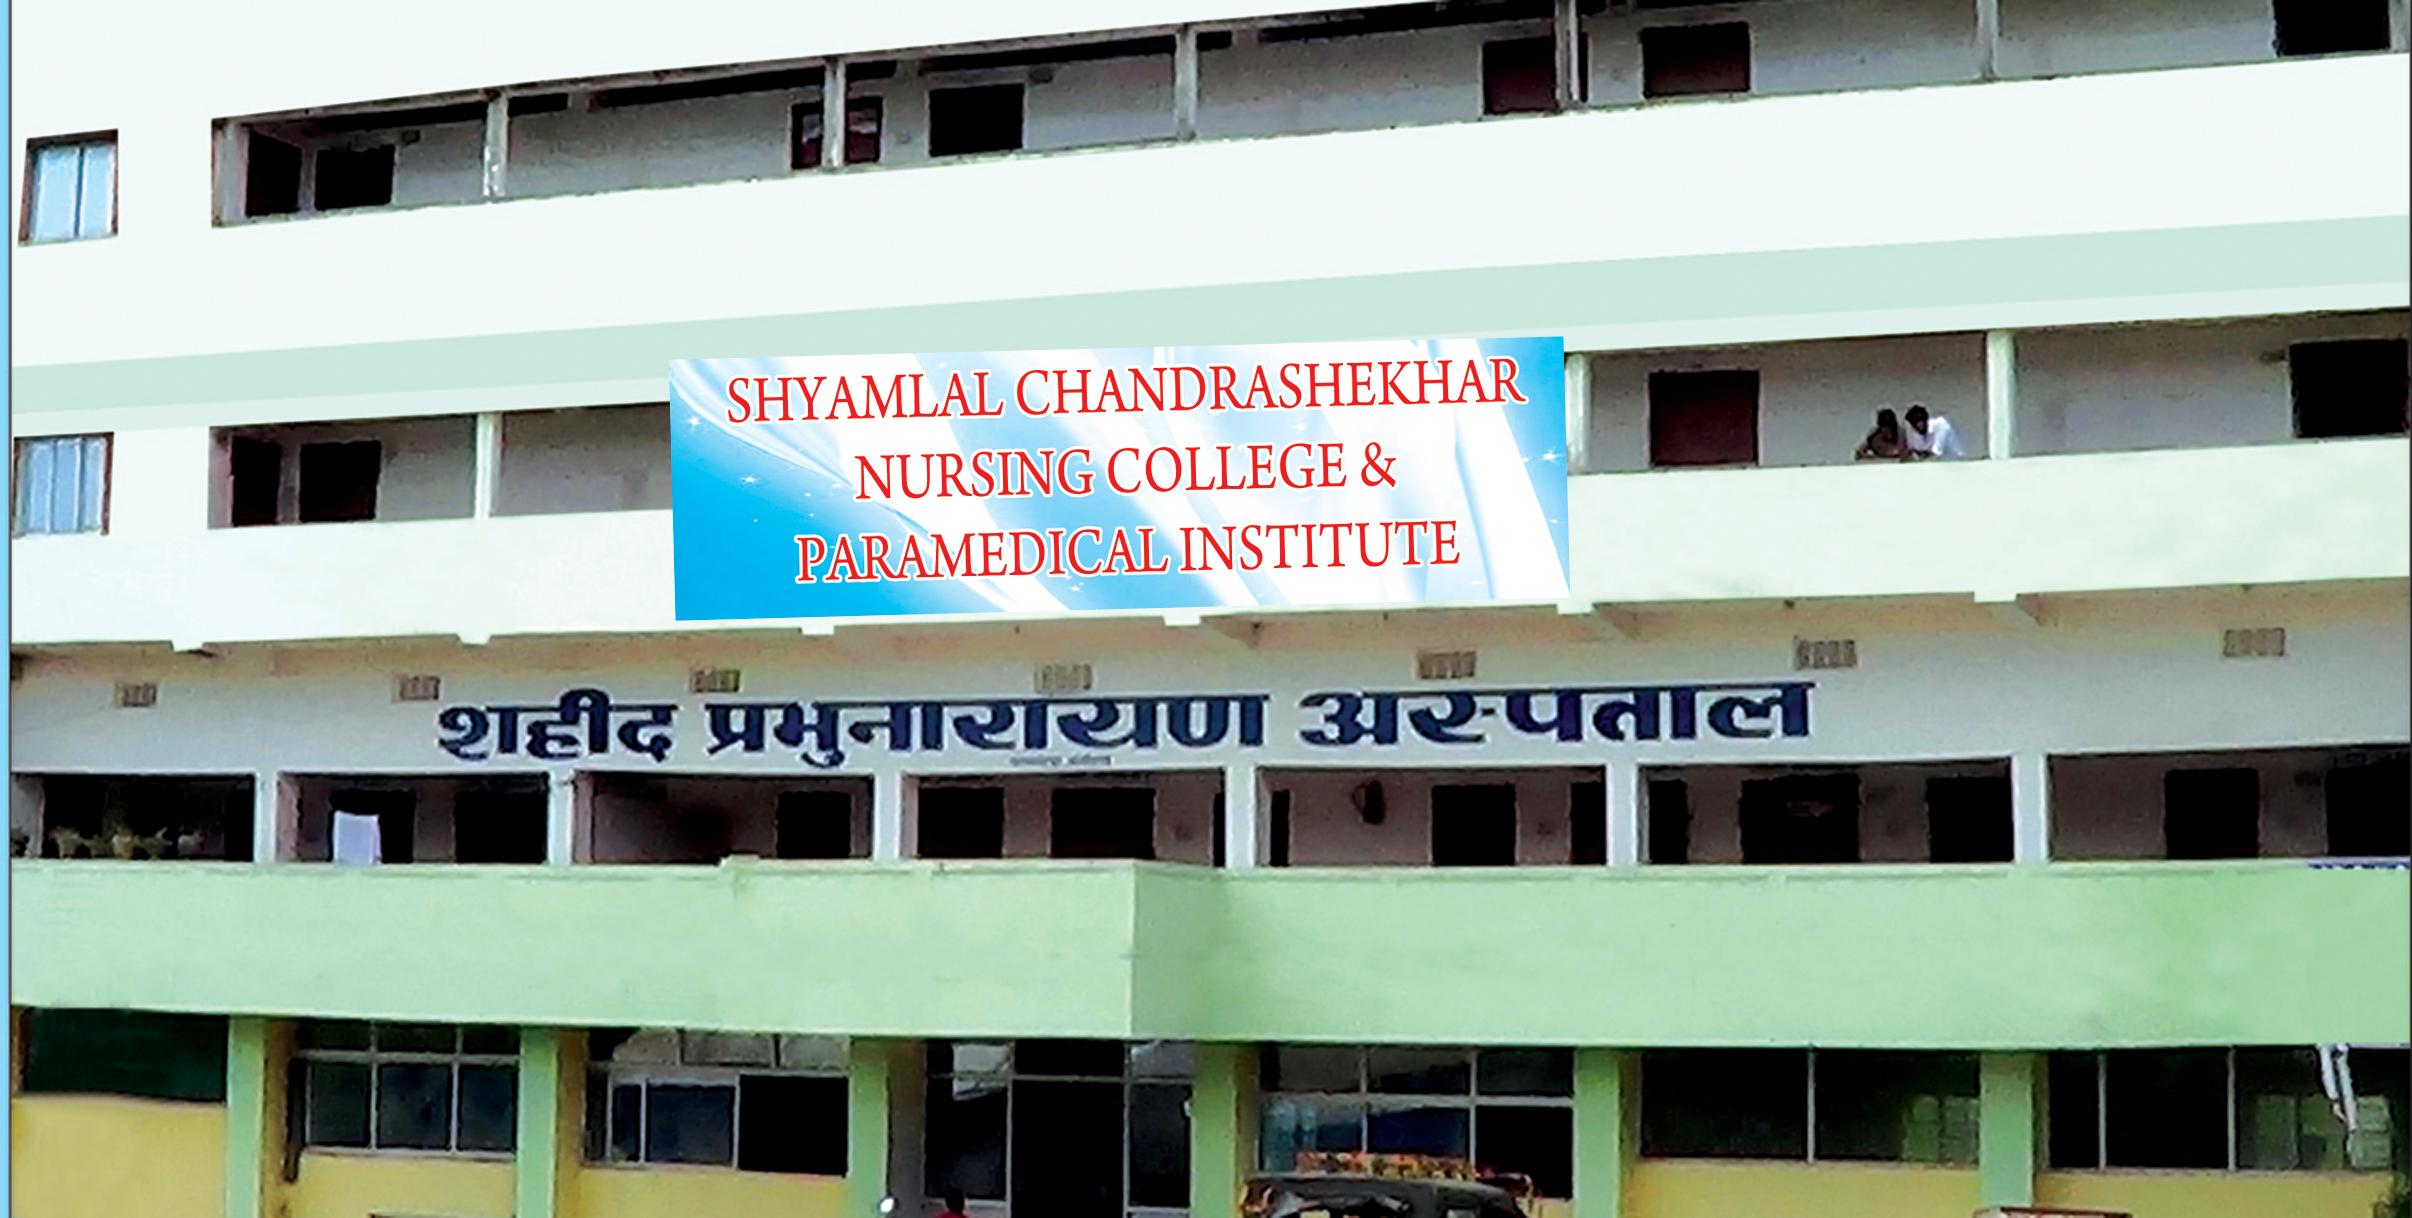 Shyamlal Chandra Shekhar Nursing College Image